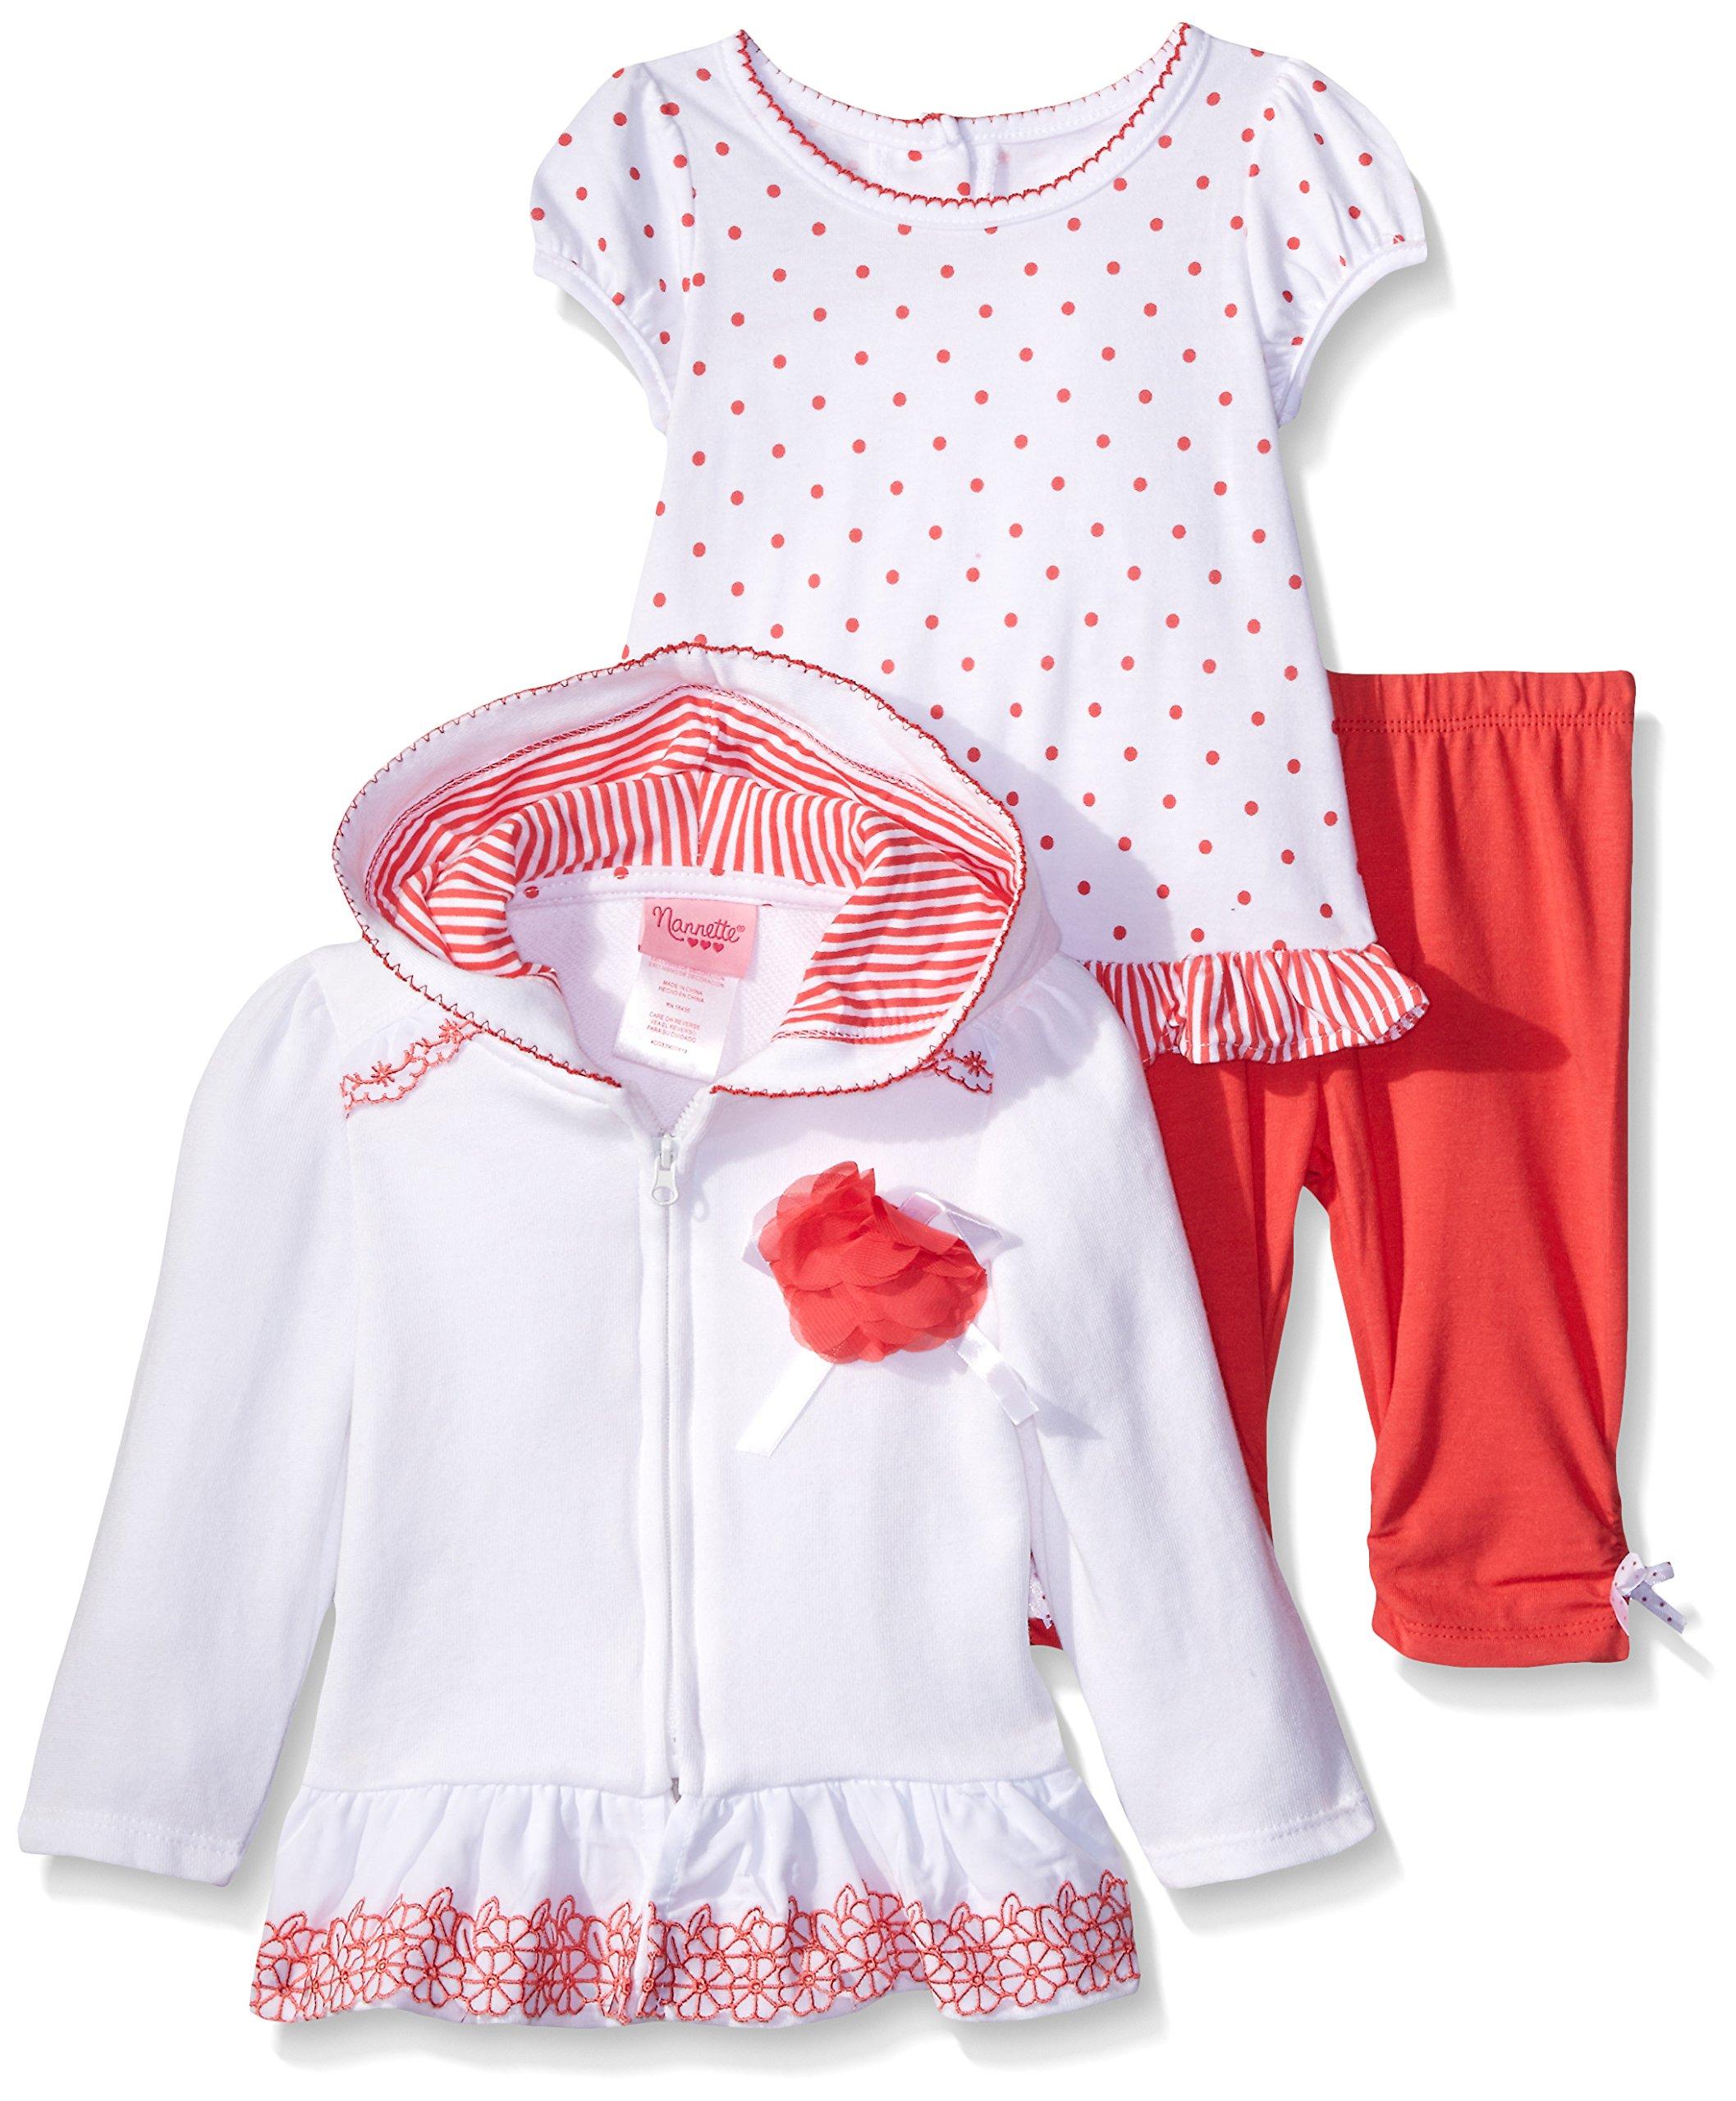 Nannette Little Girls 3 Piece Hooded Jacket Shirt and Legging Set, White, 24 Months